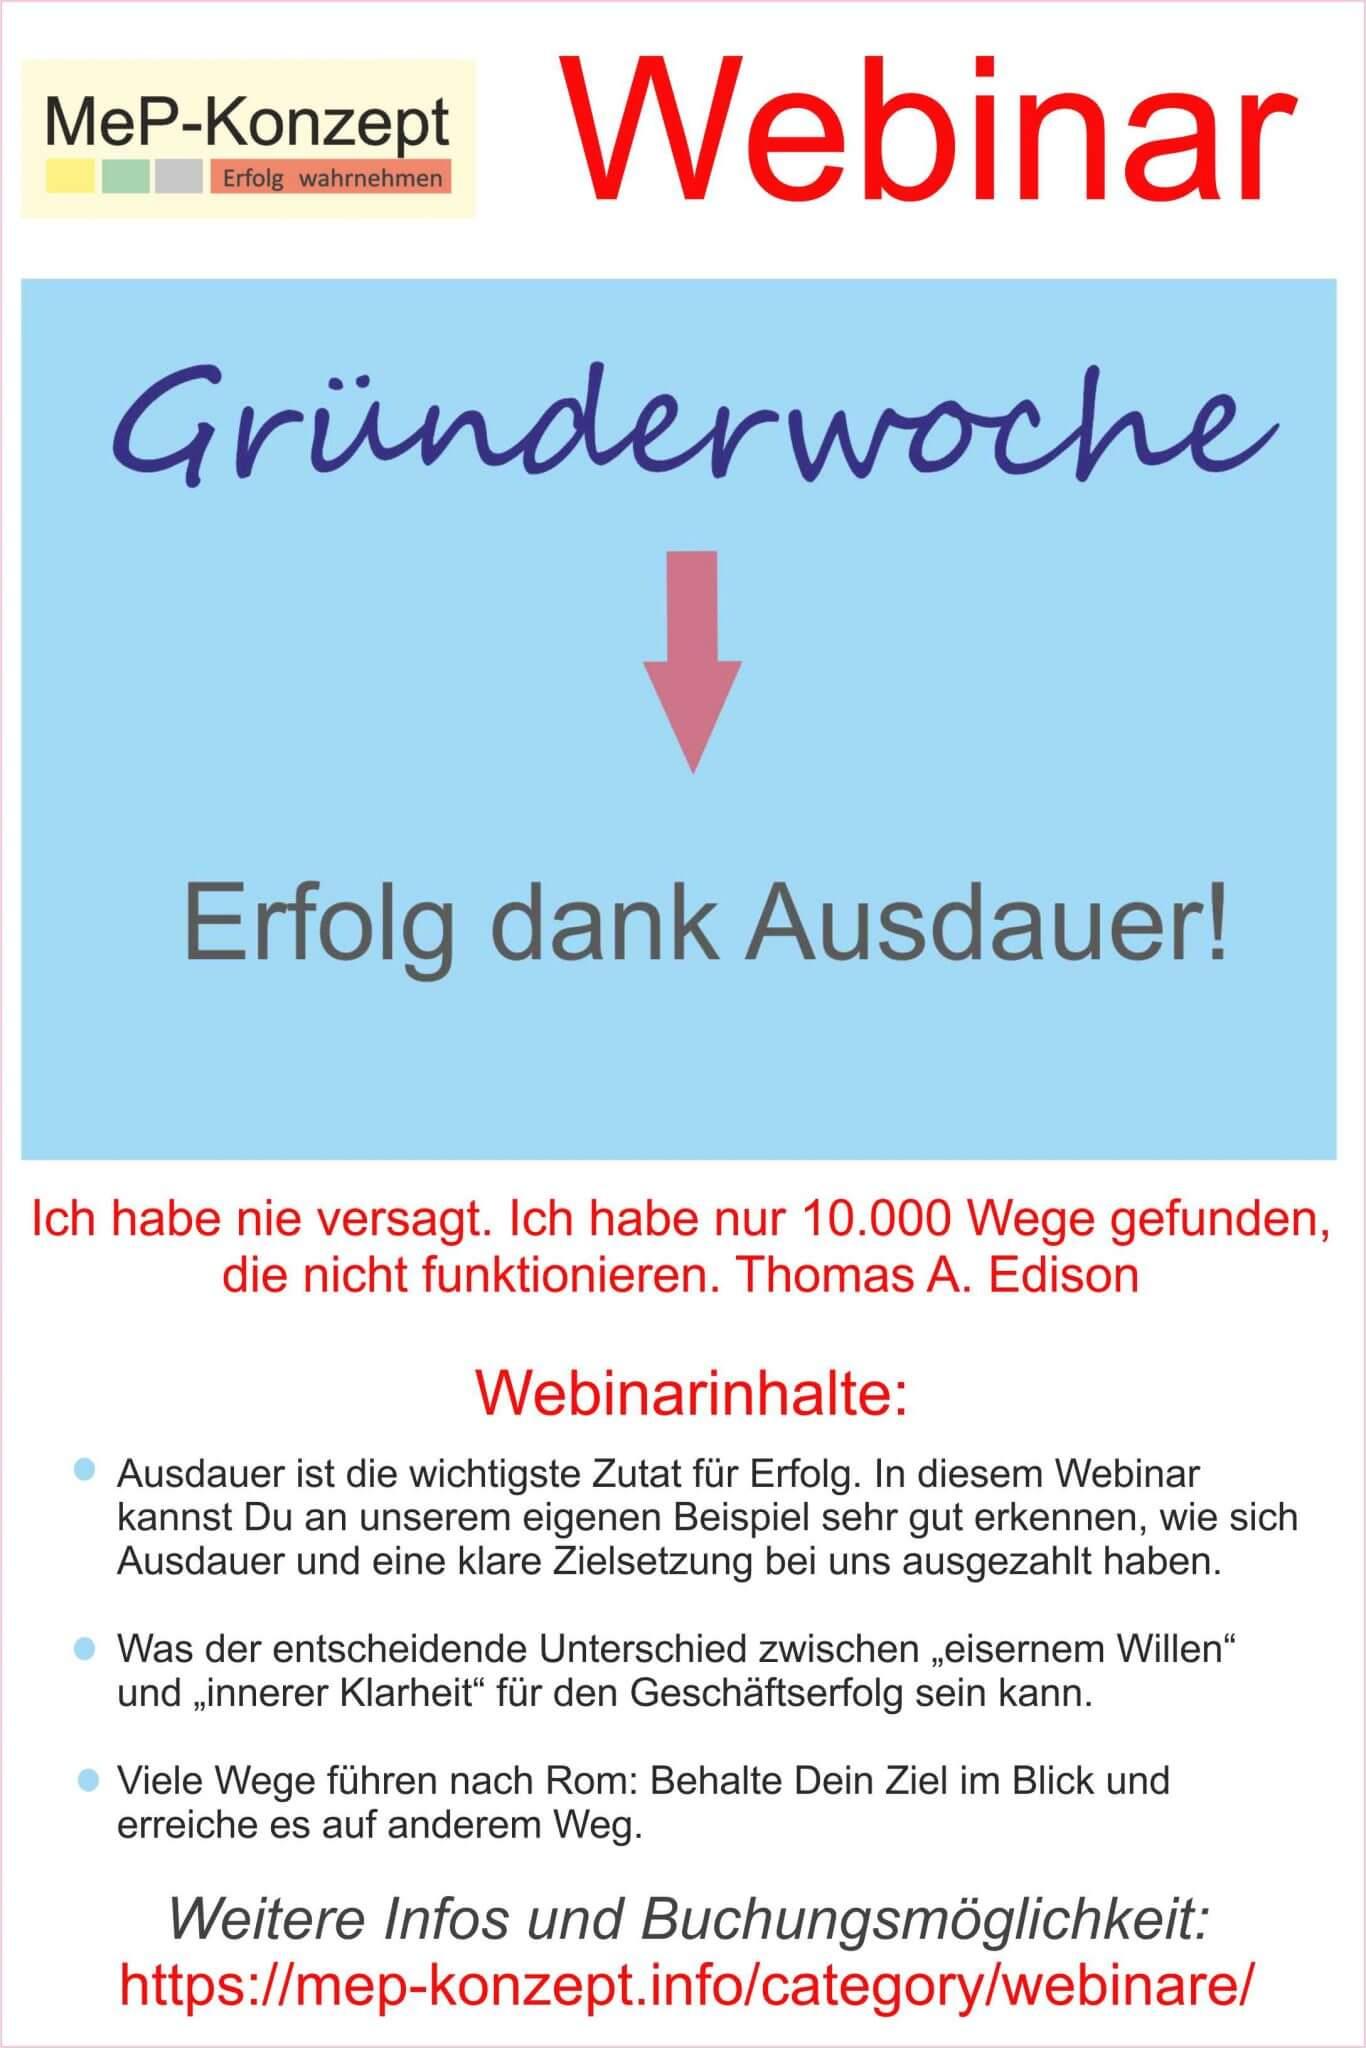 Gründerwoche-Webinar: Erfolg Dank Ausdauer